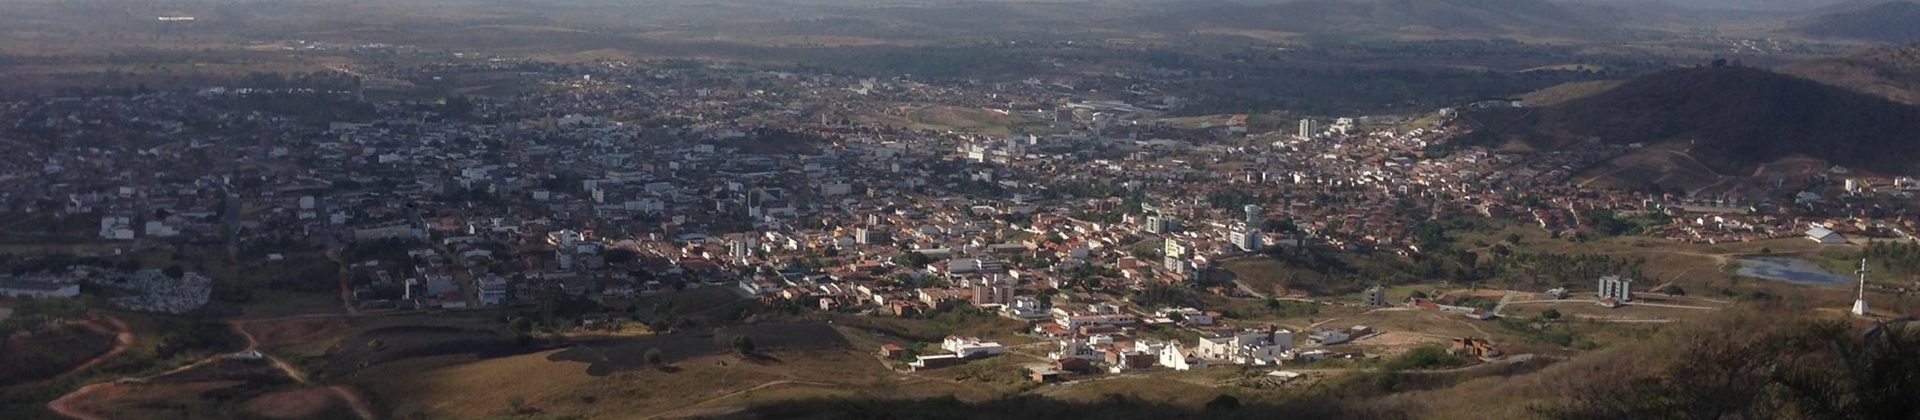 Guarabira_vista_panoramica